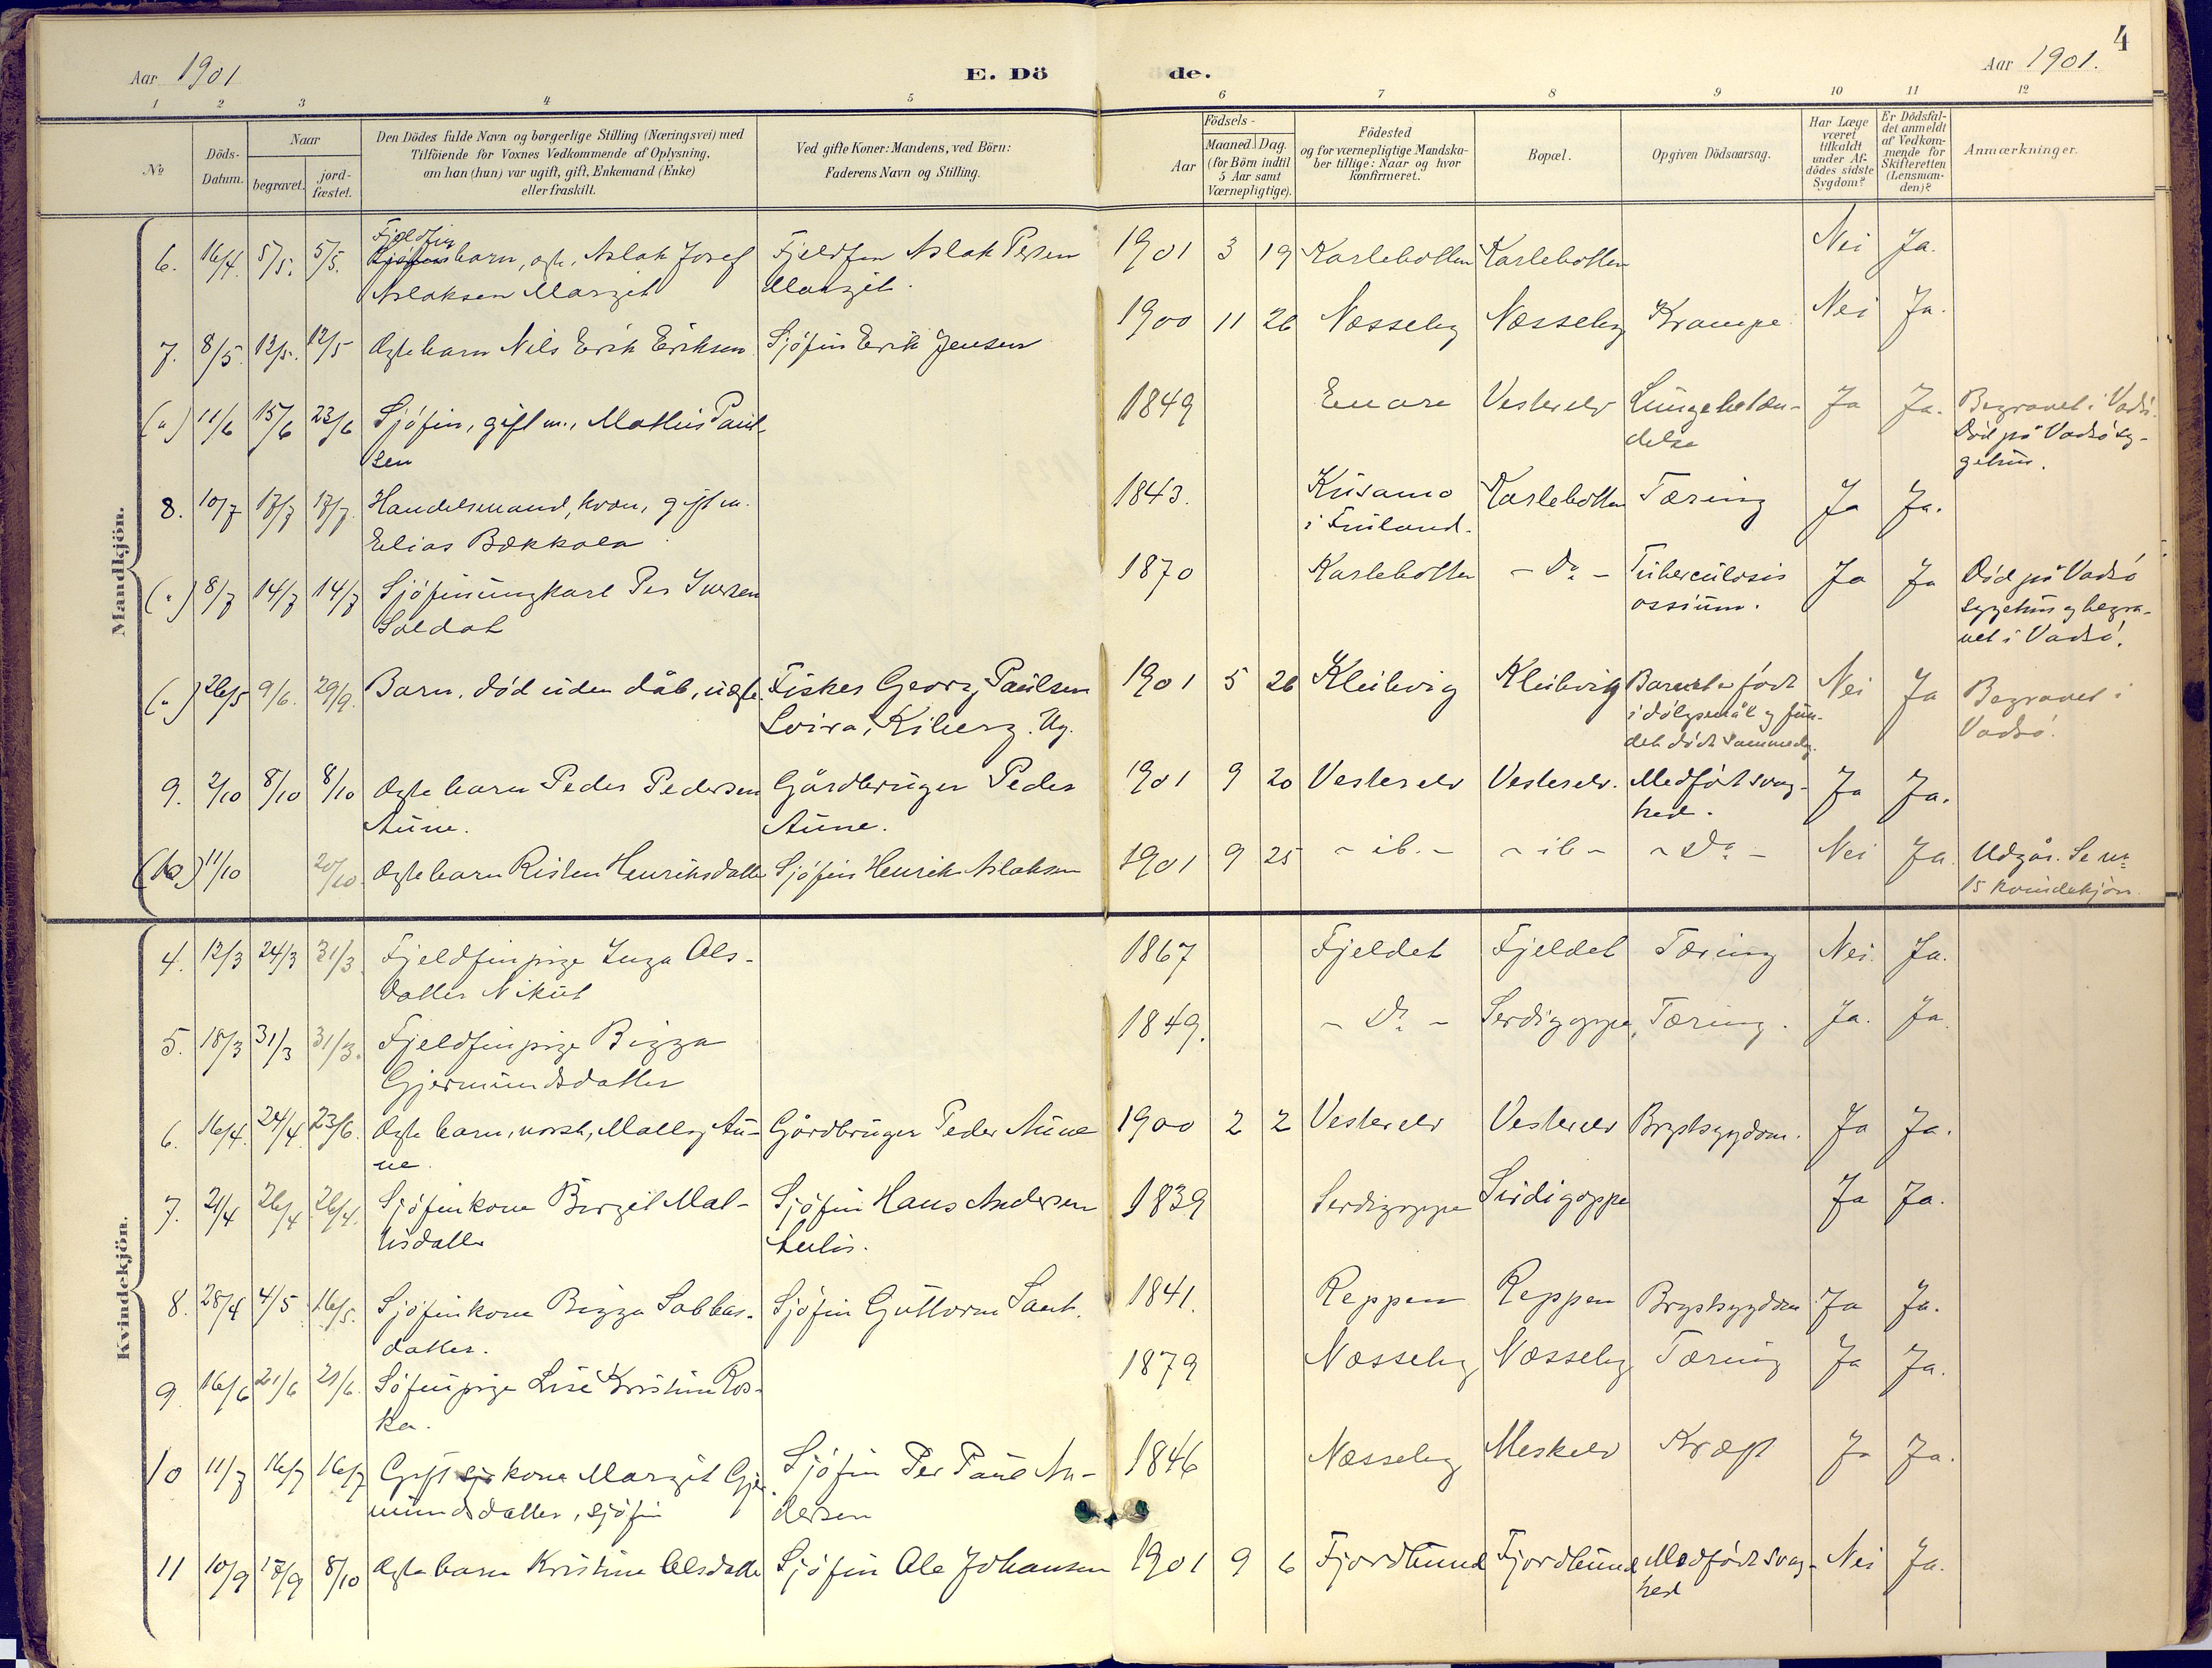 SATØ, Nesseby sokneprestkontor, H/Ha/L0007kirke: Ministerialbok nr. 7, 1898-1921, s. 4